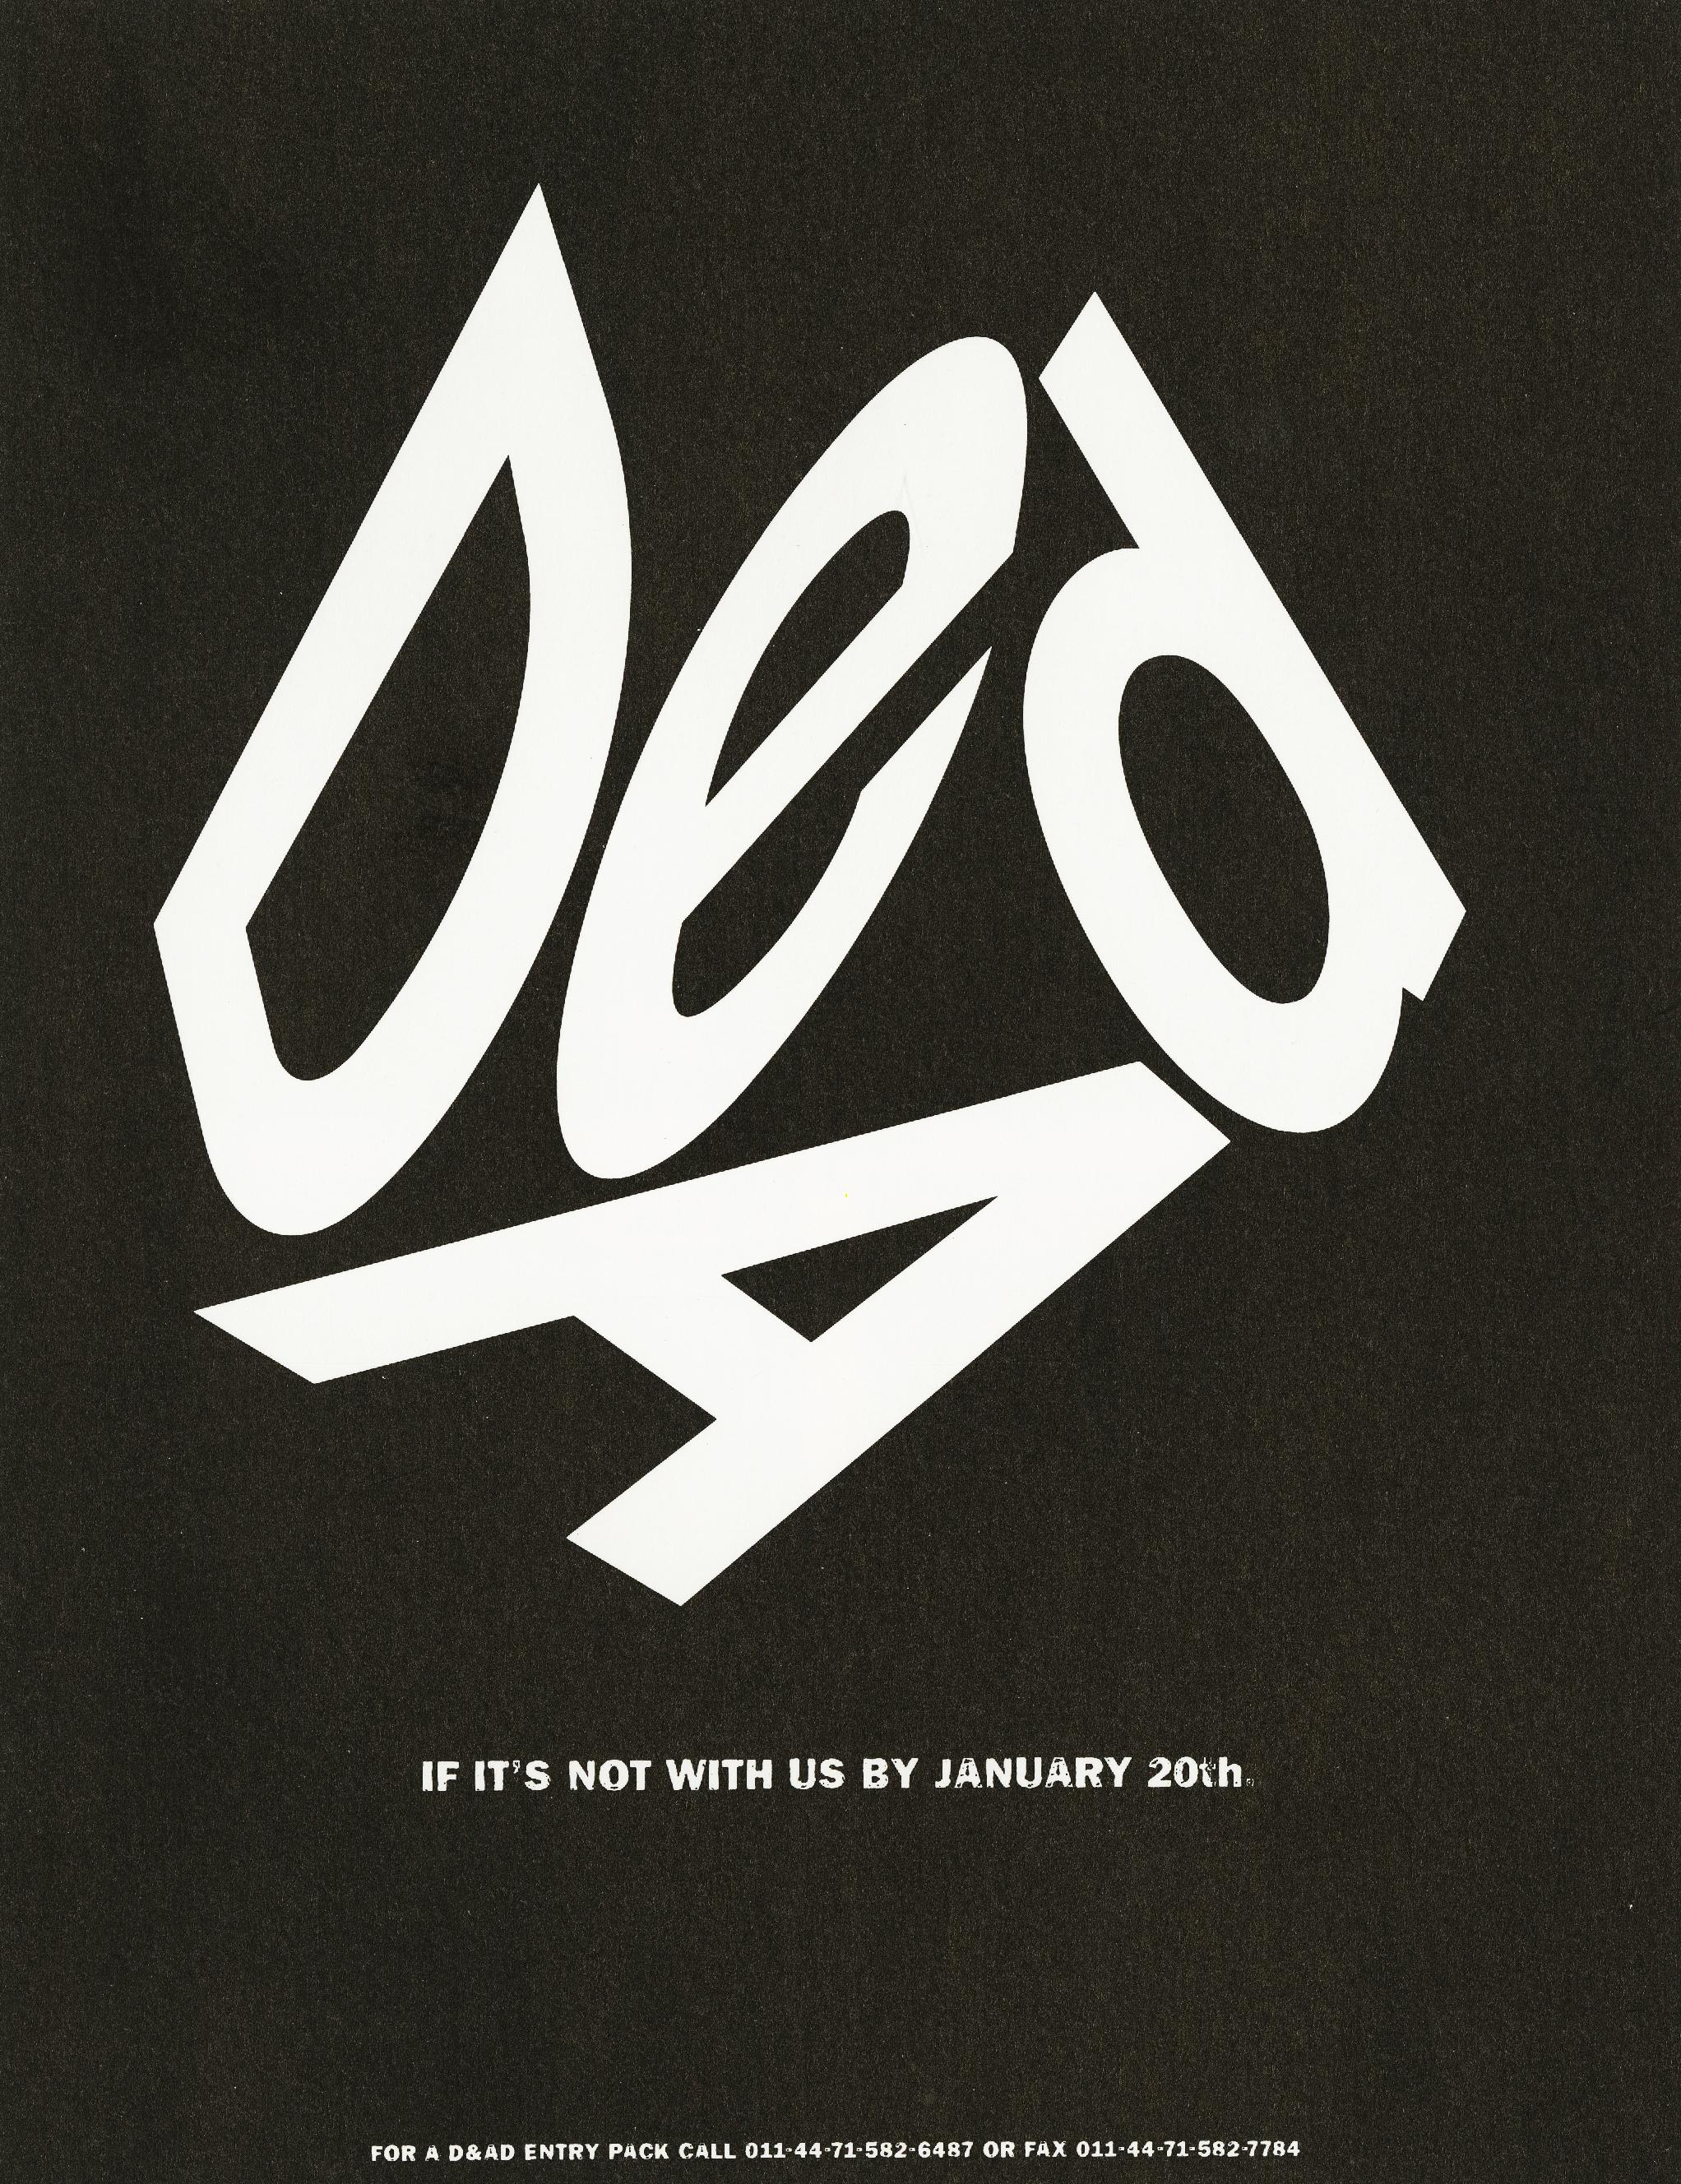 'Dead' D&AD, Peter Souter, AMV-01.jpg